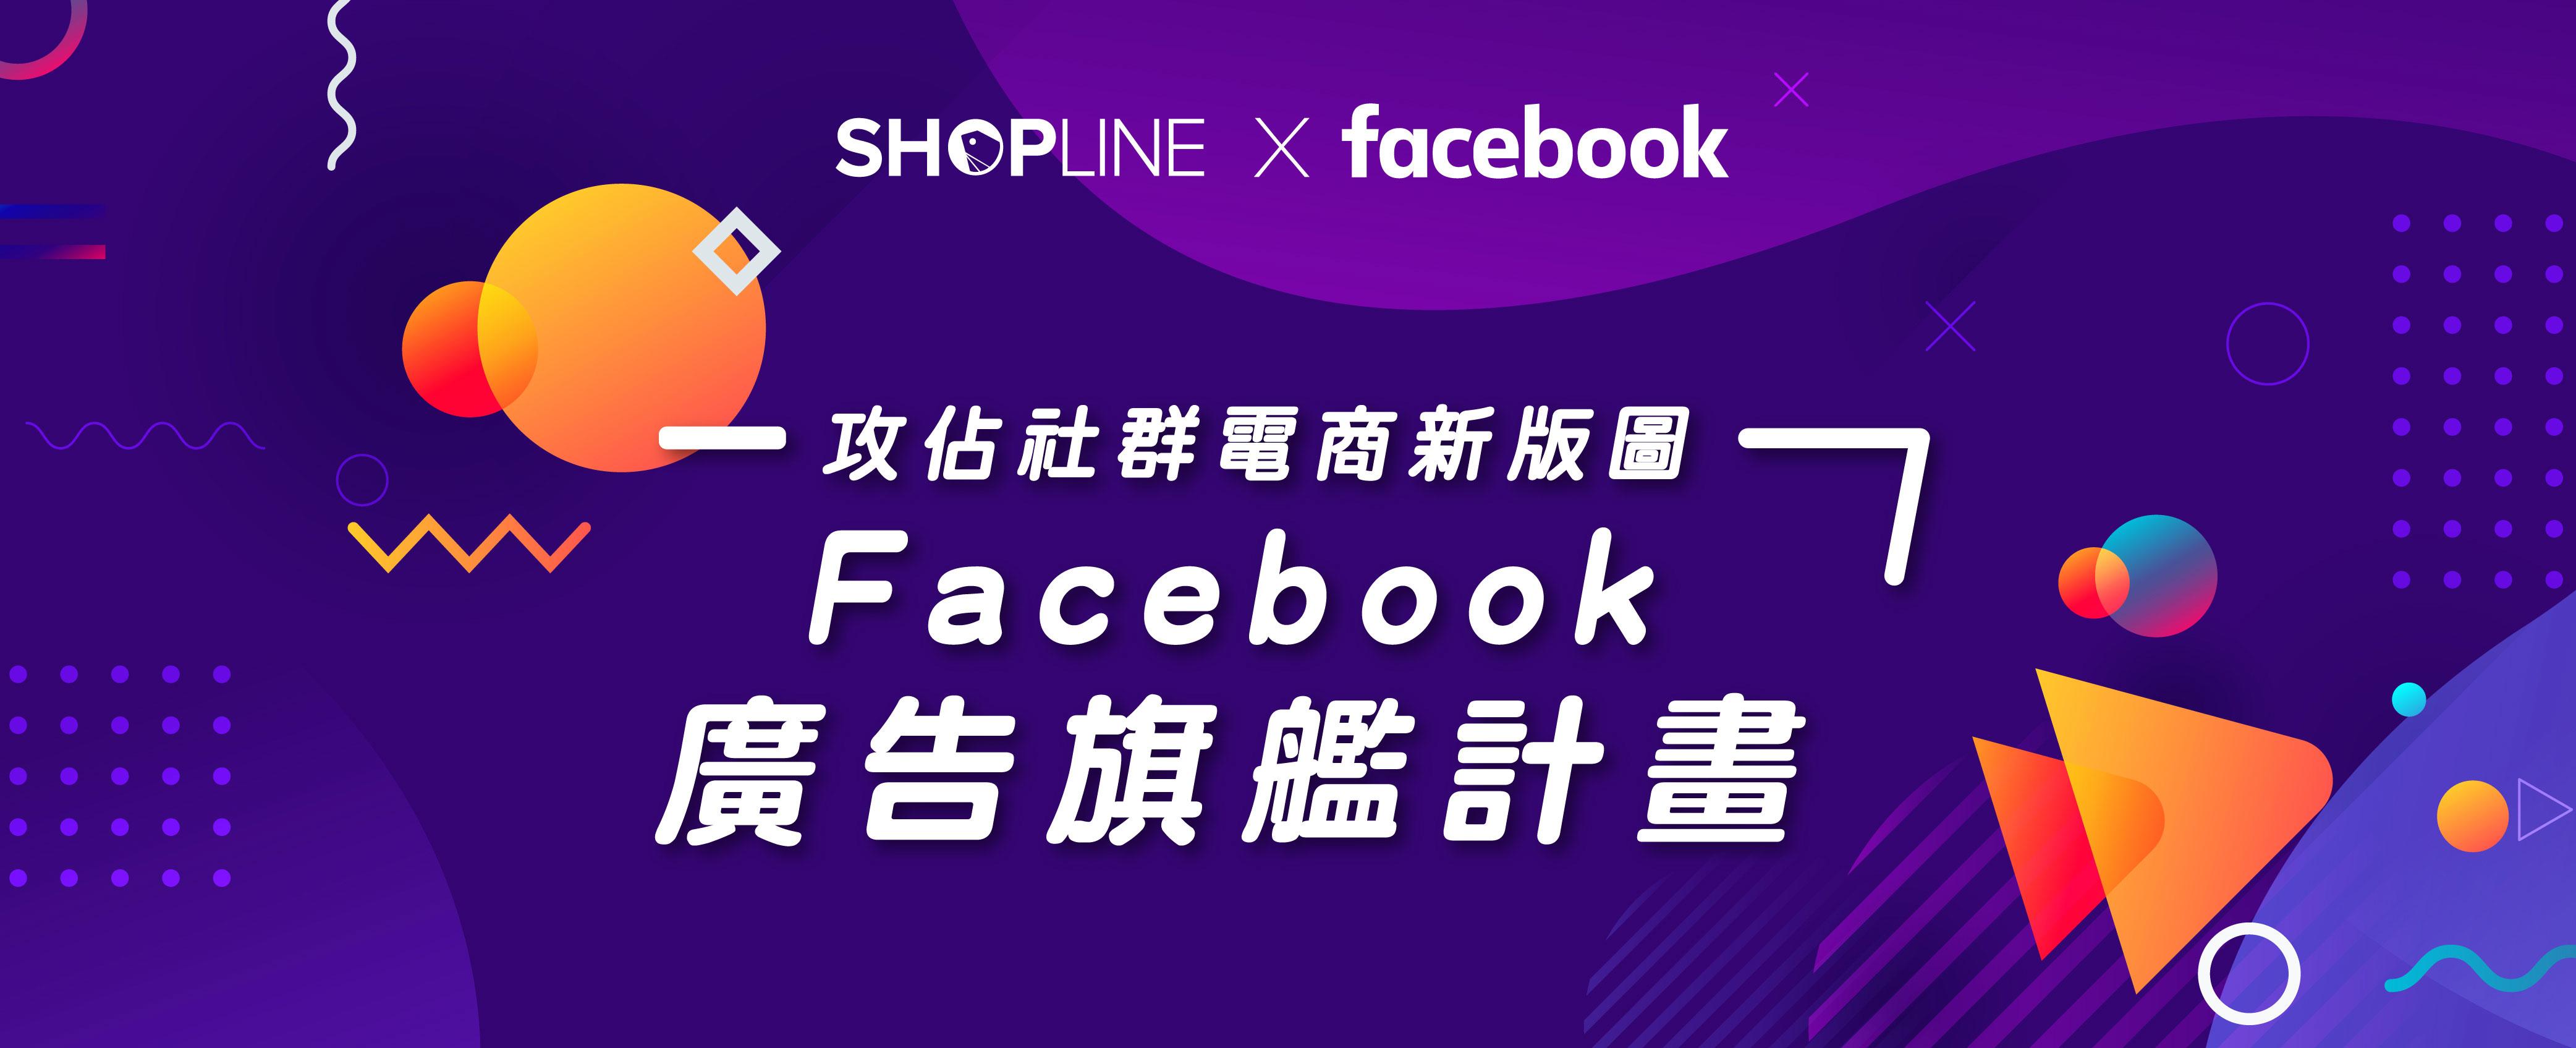 SHOPLINE x Facebook 廣告旗艦計畫